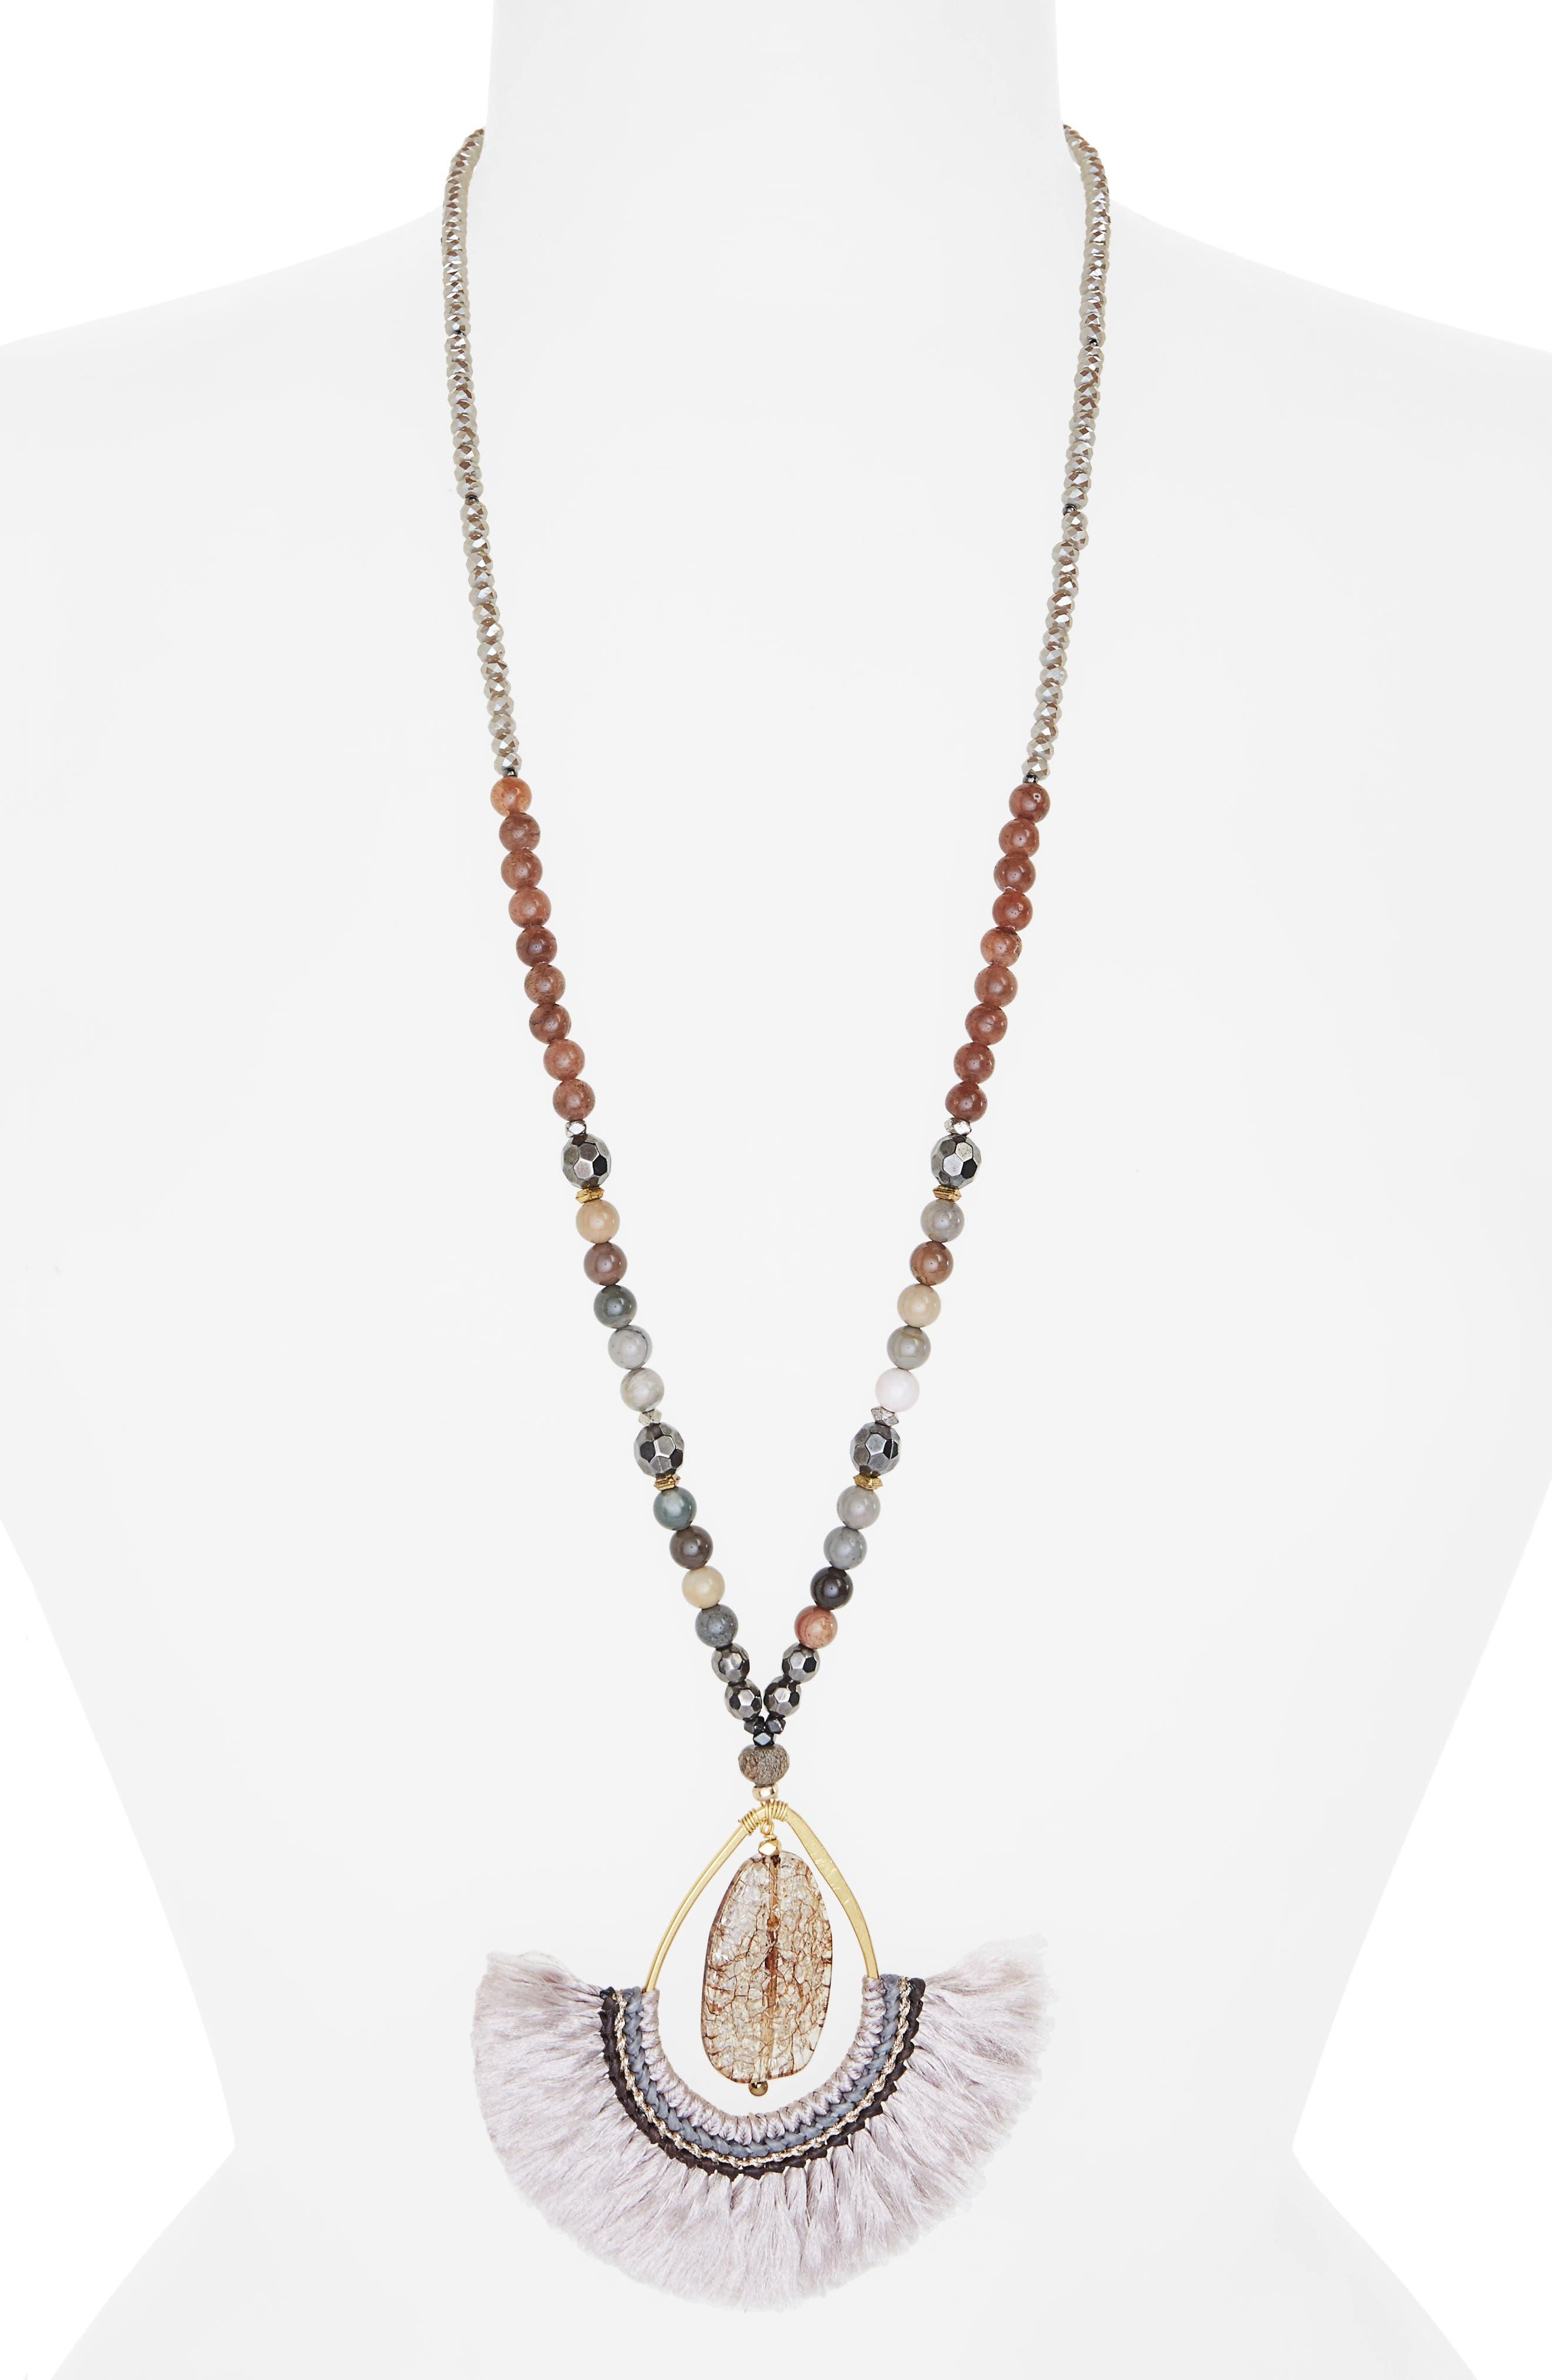 Alternate Image 1 Selected - Nakamol Design Fringed Agate Teardrop Pendant Necklace